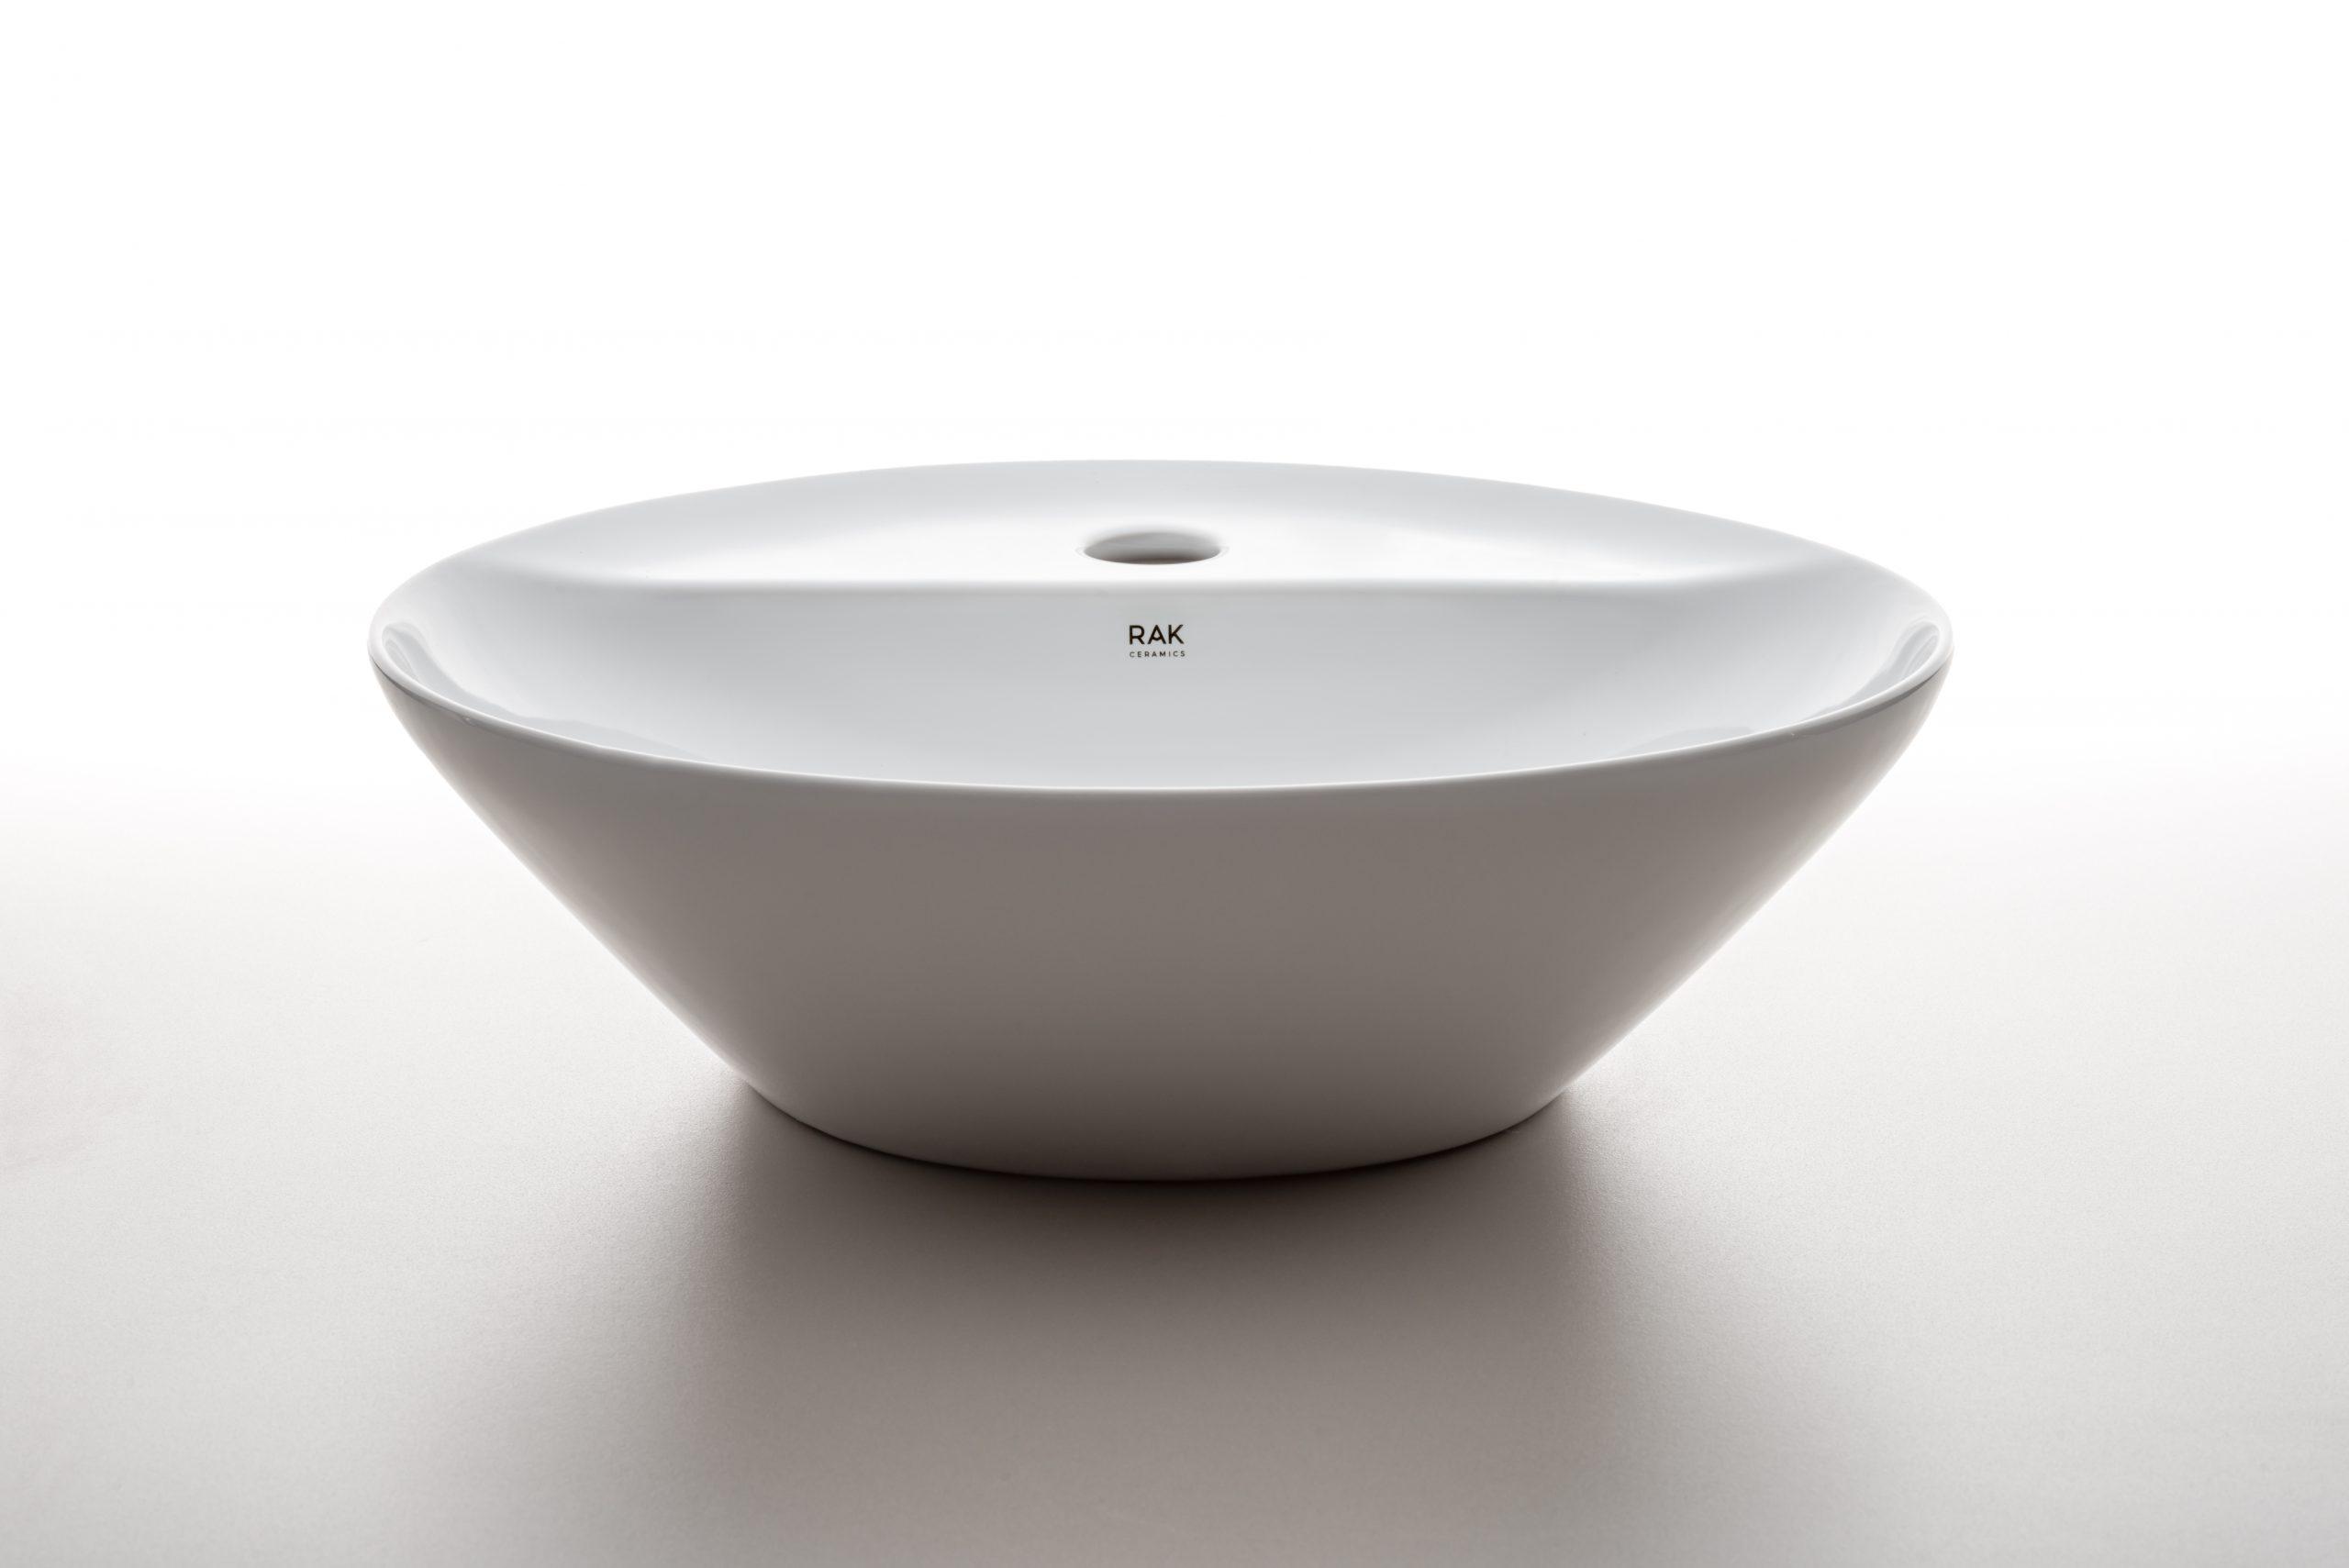 Round Variant washbasins designed by Debiasi Sandri for RAK Ceramics